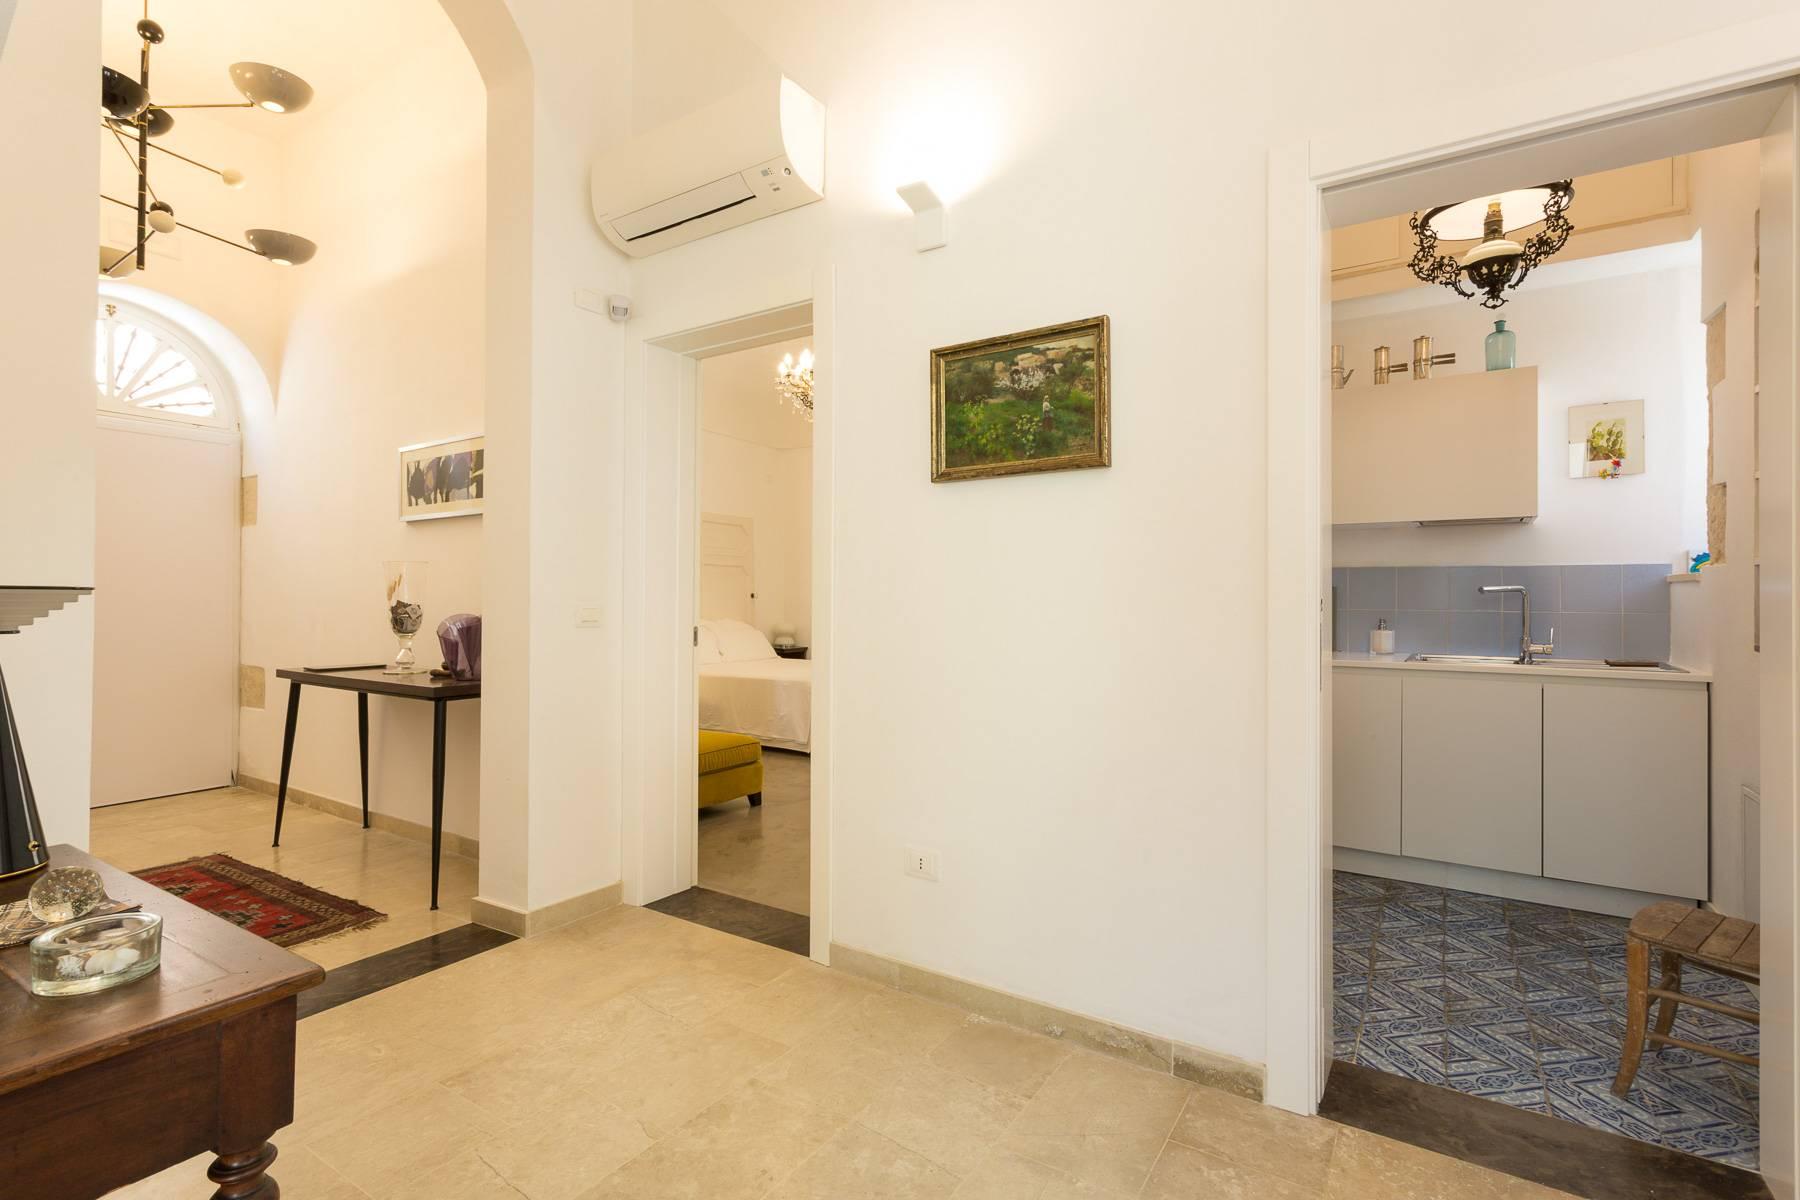 Casa indipendente in Vendita a Noto: 5 locali, 171 mq - Foto 6